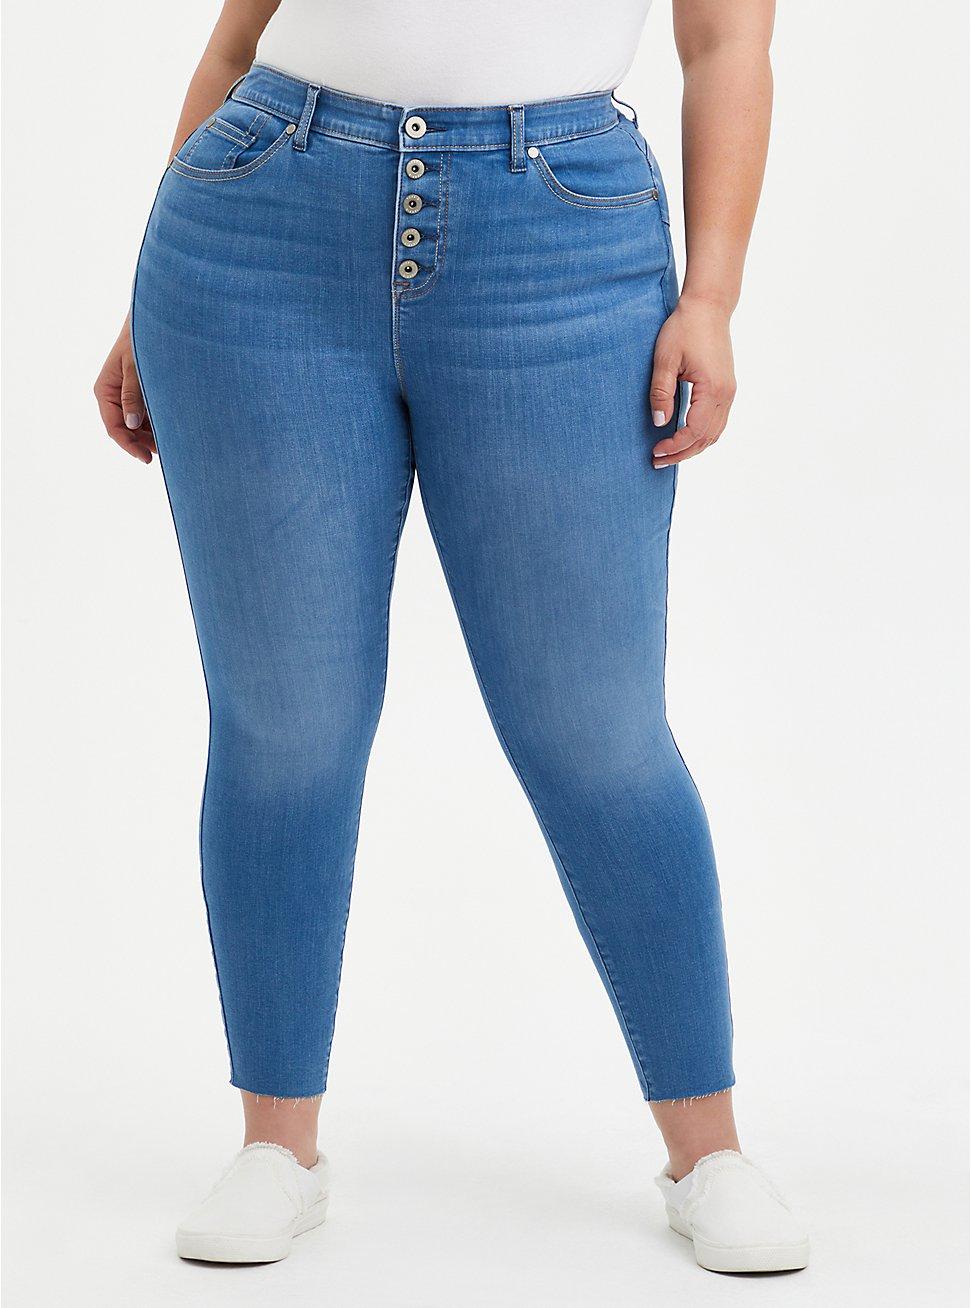 Bombshell Skinny Jean - Super Soft Eco Medium Wash, HIP HUGGER, hi-res